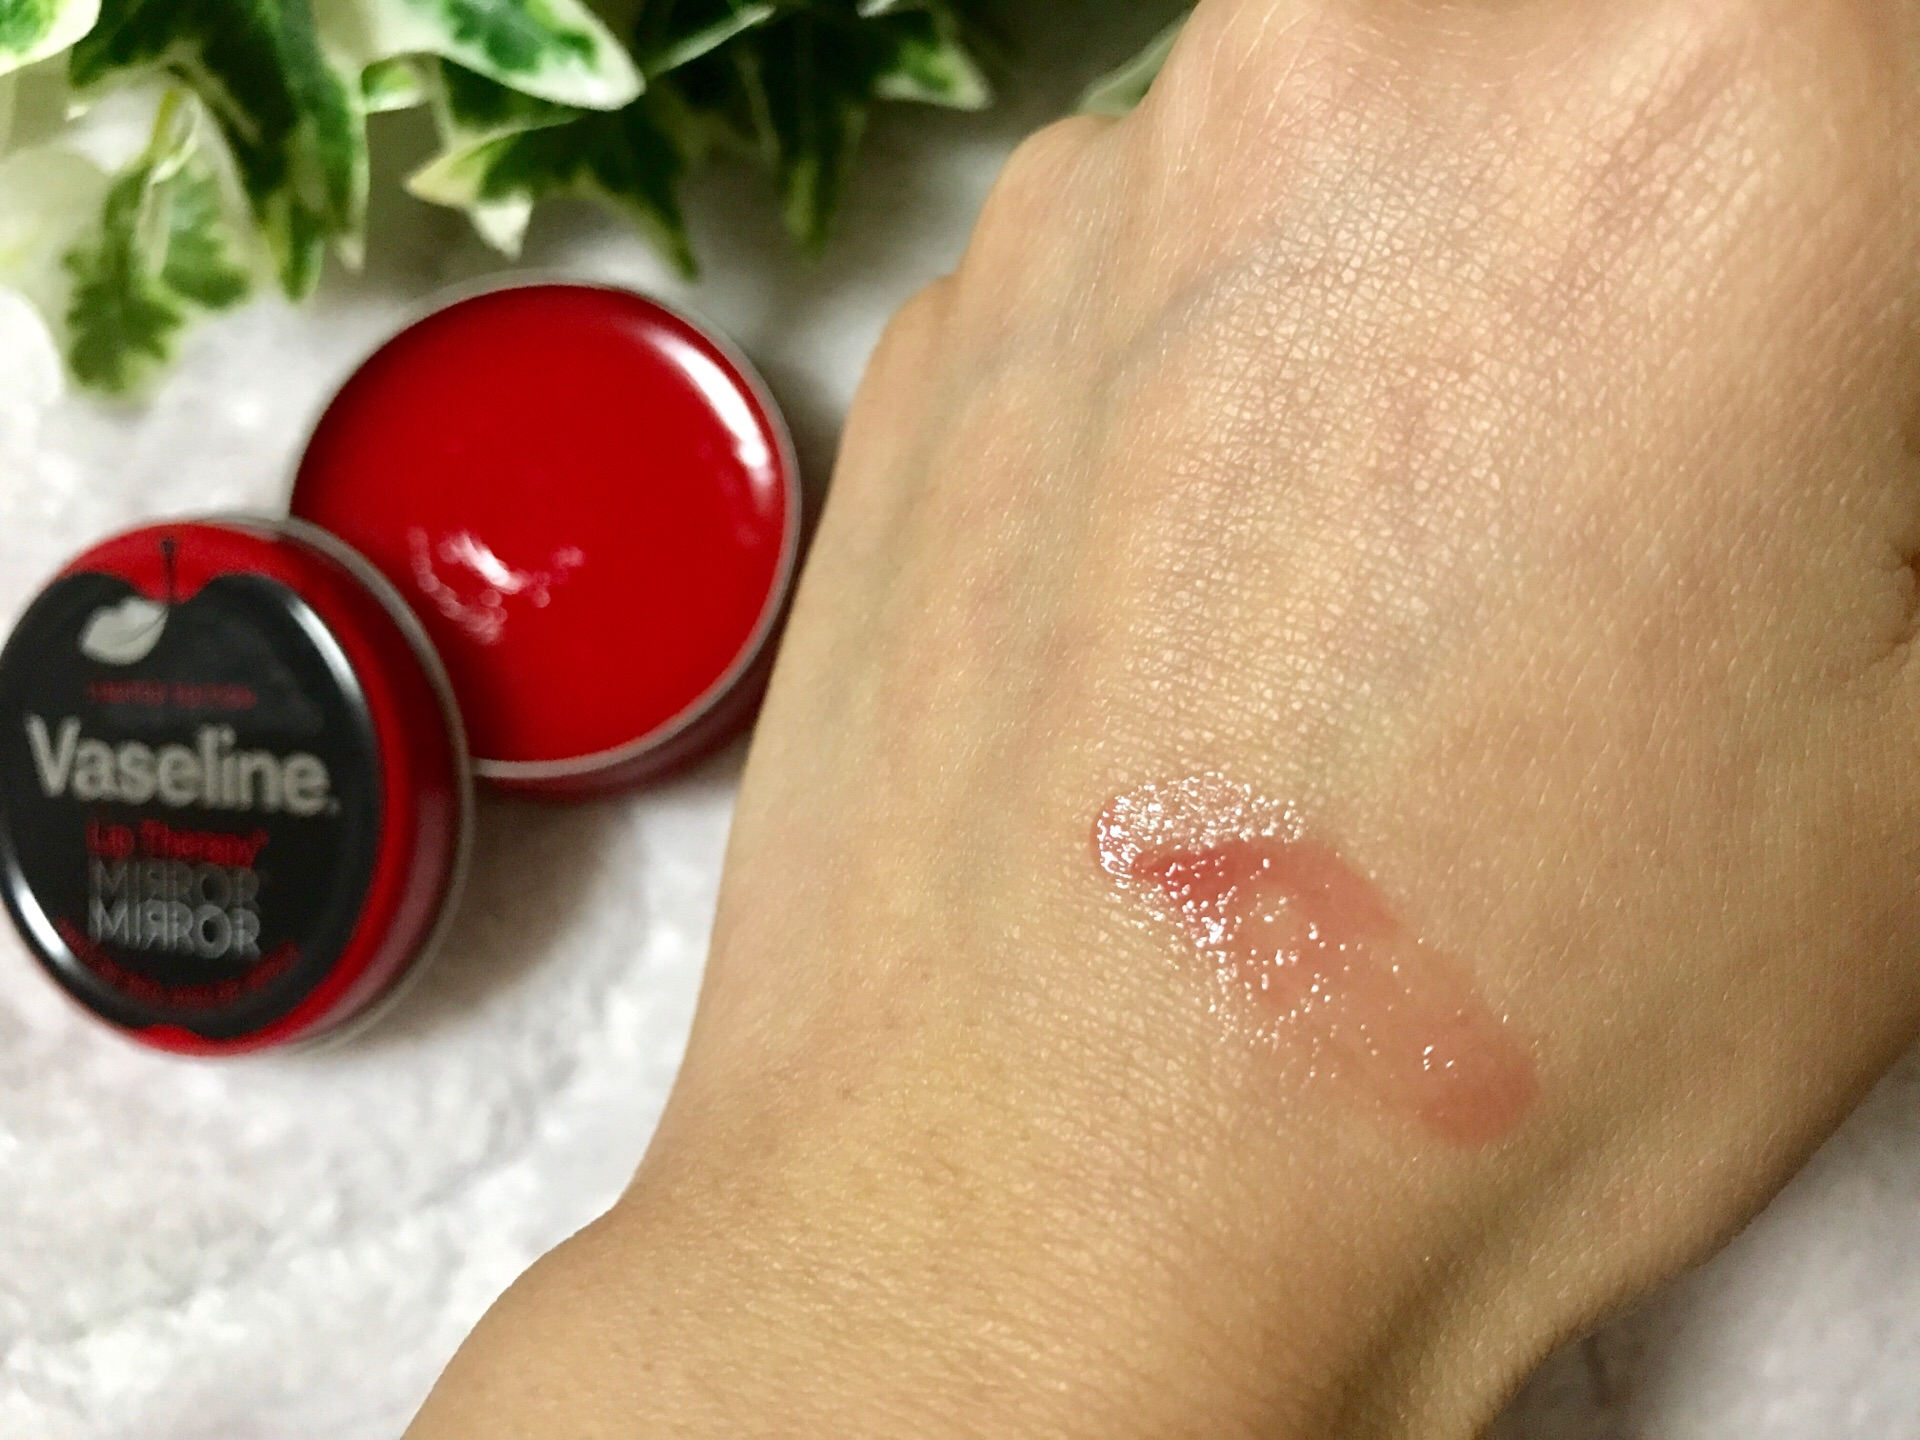 【Vaseline】2018年限定!保湿力を誇る大人気リップから《アップルの香り》が限定販売中♡_3